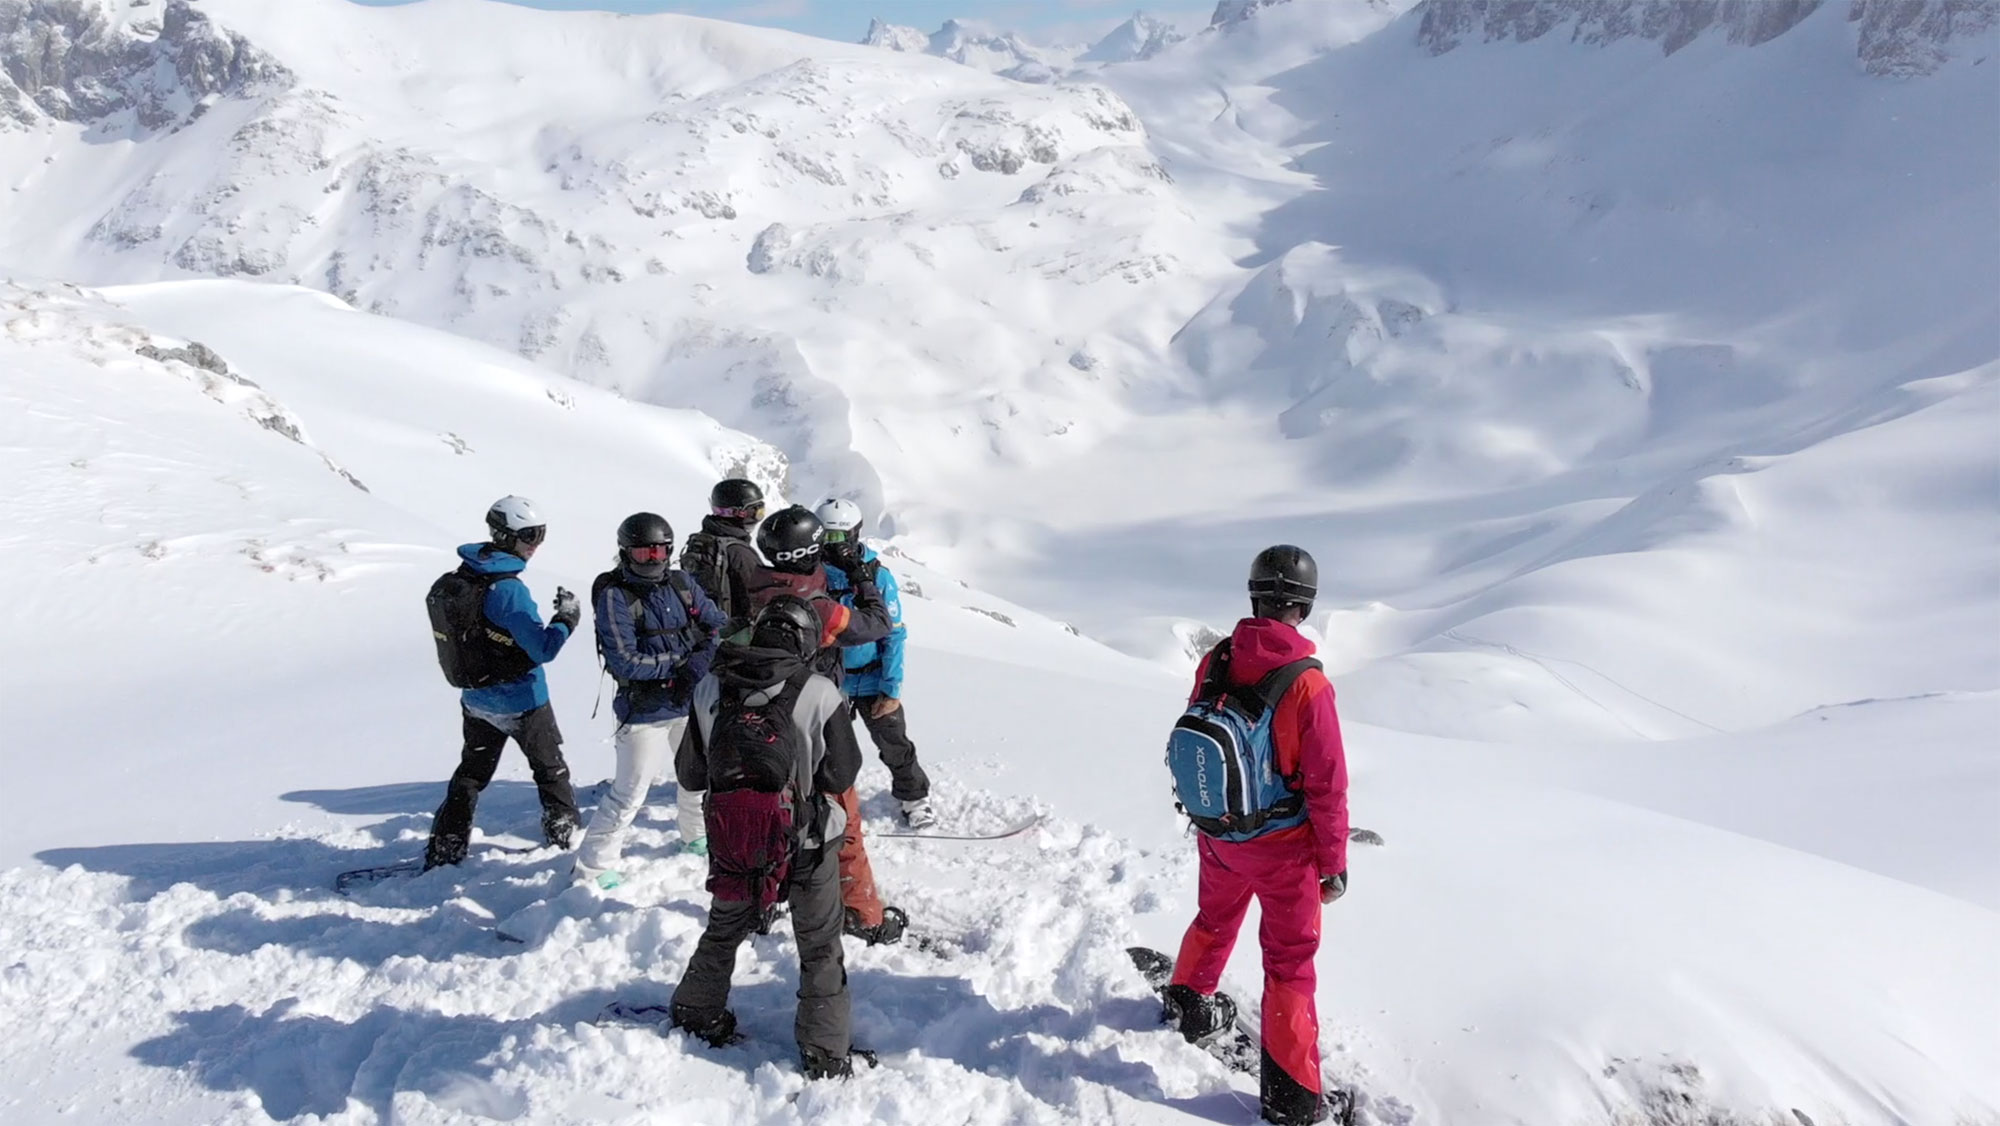 Wetter 14 am arlberg lech tage